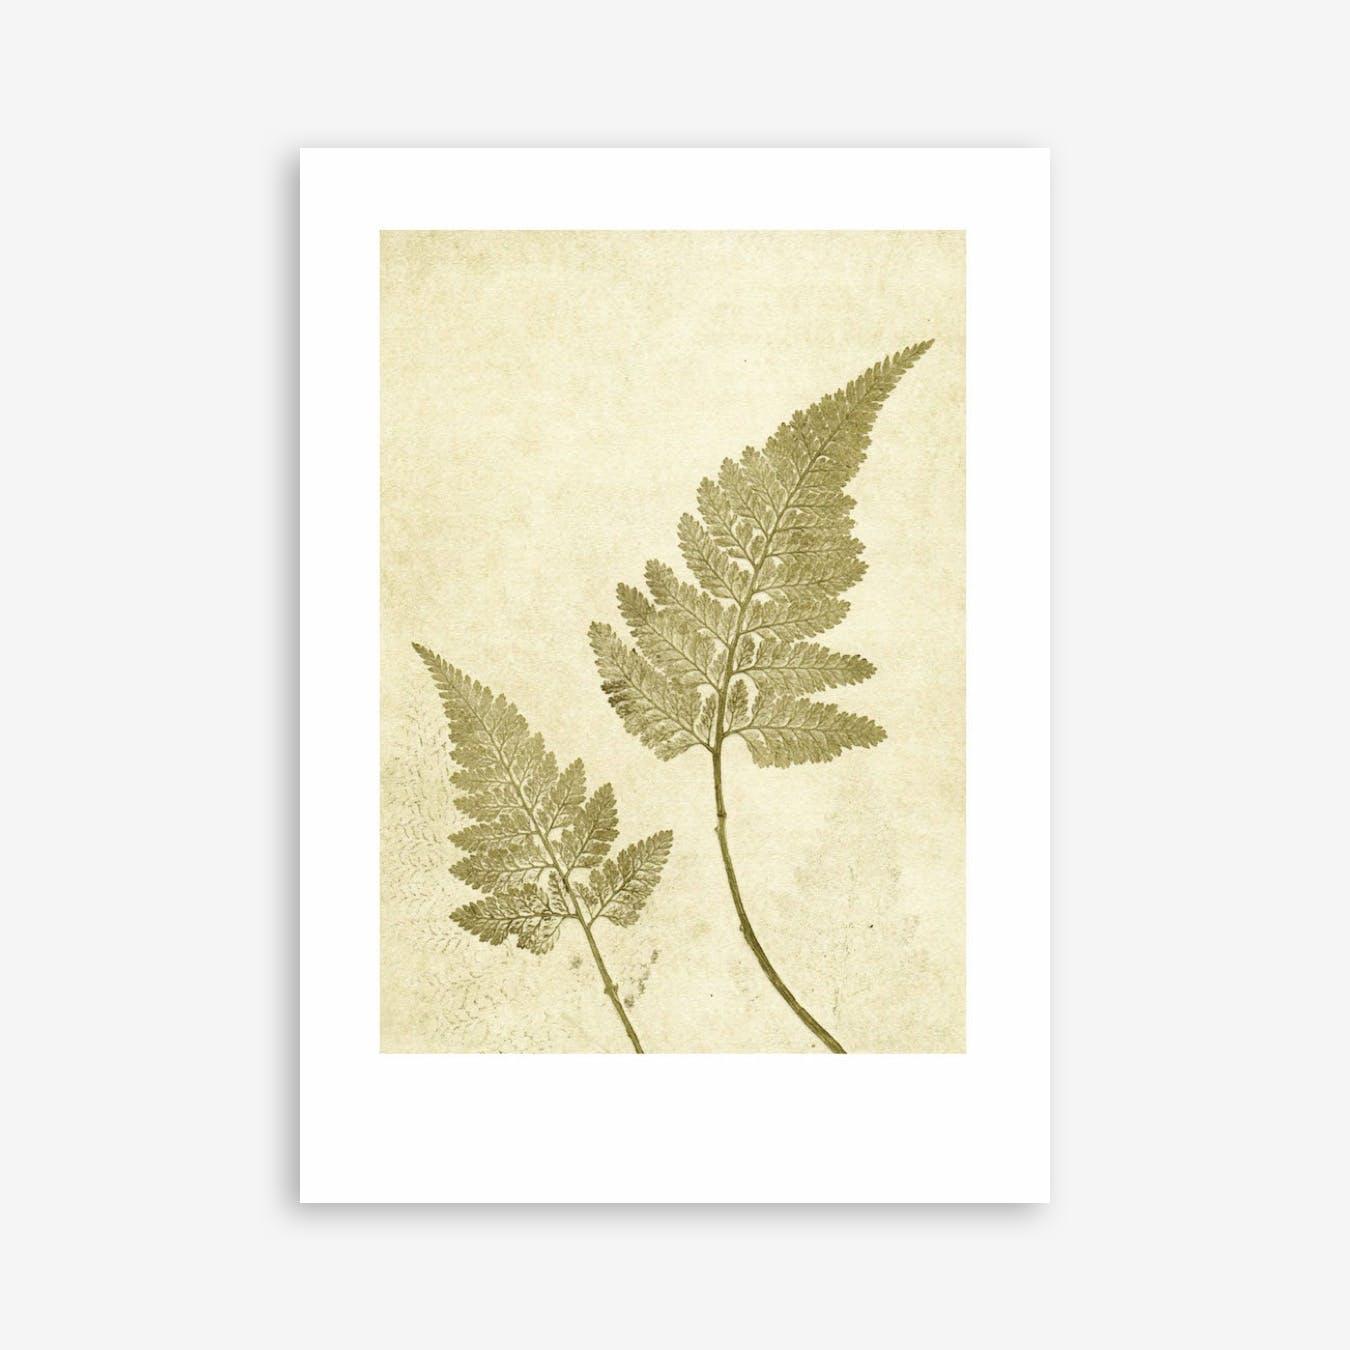 Fern Olive Print In 50cm x 70cm